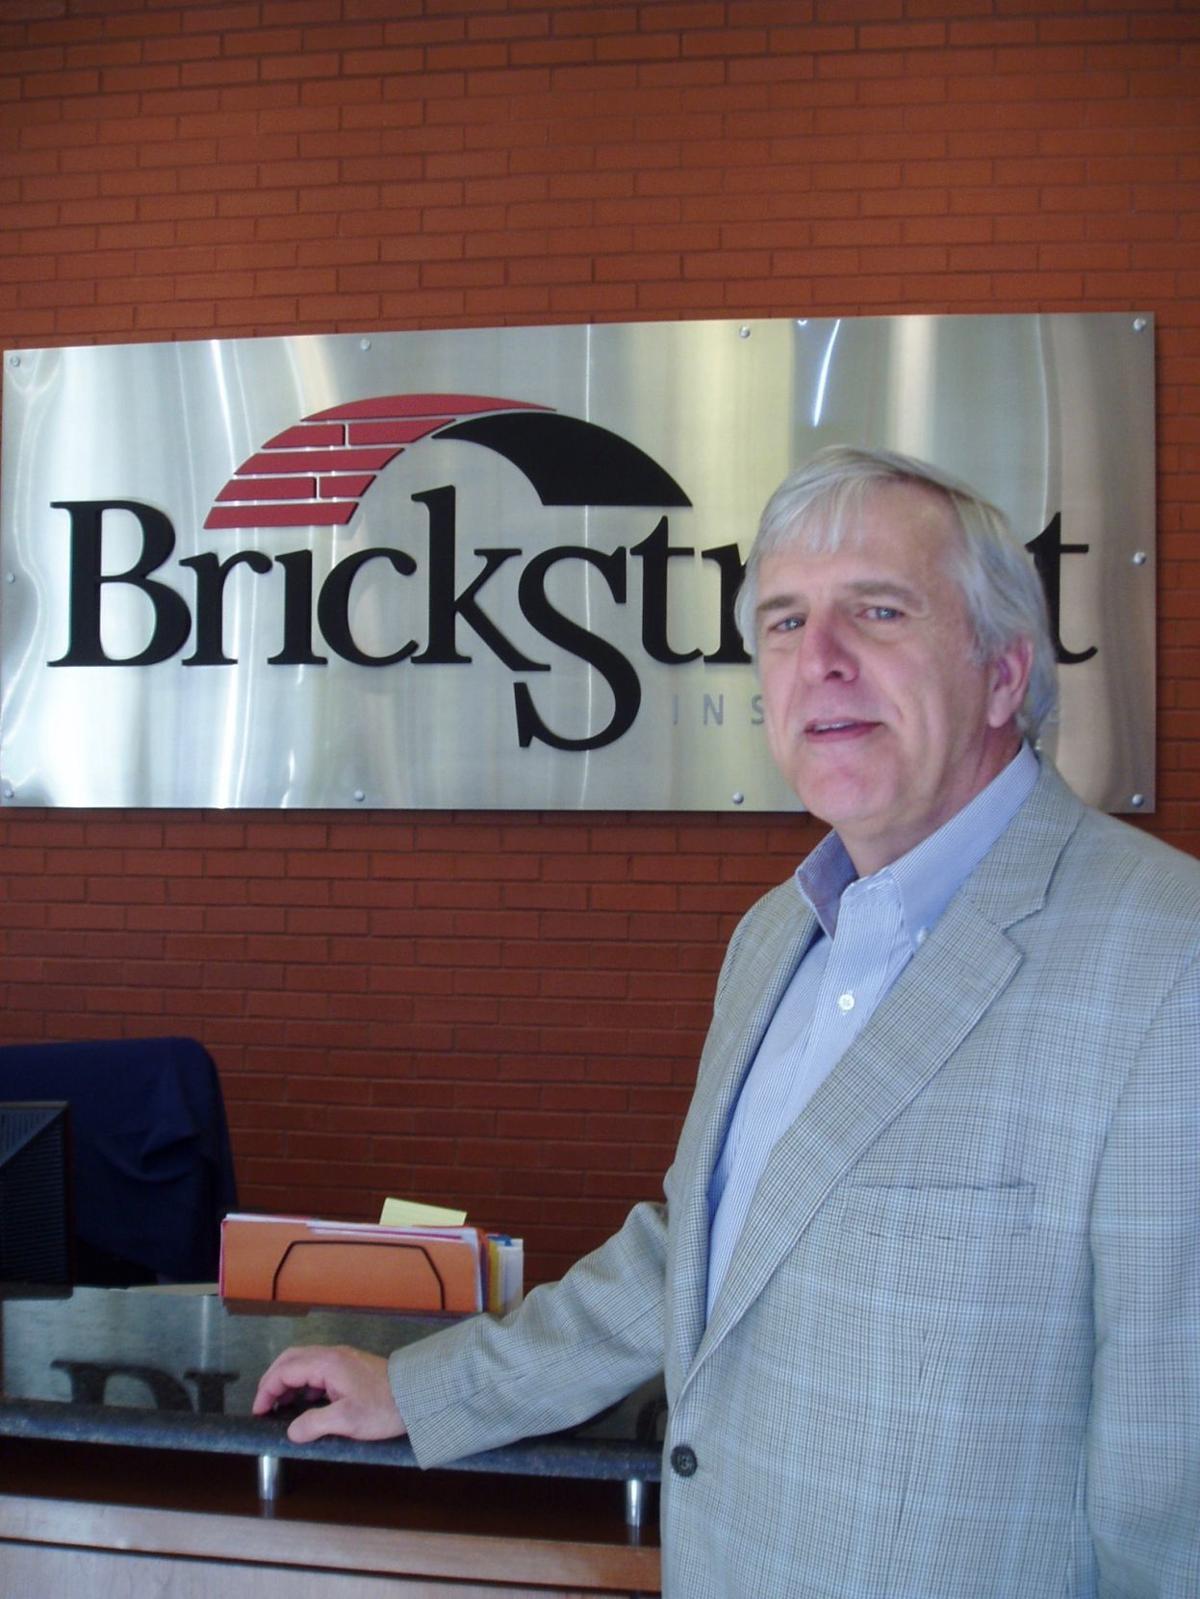 Greg Burton, CEO of BrickStreet